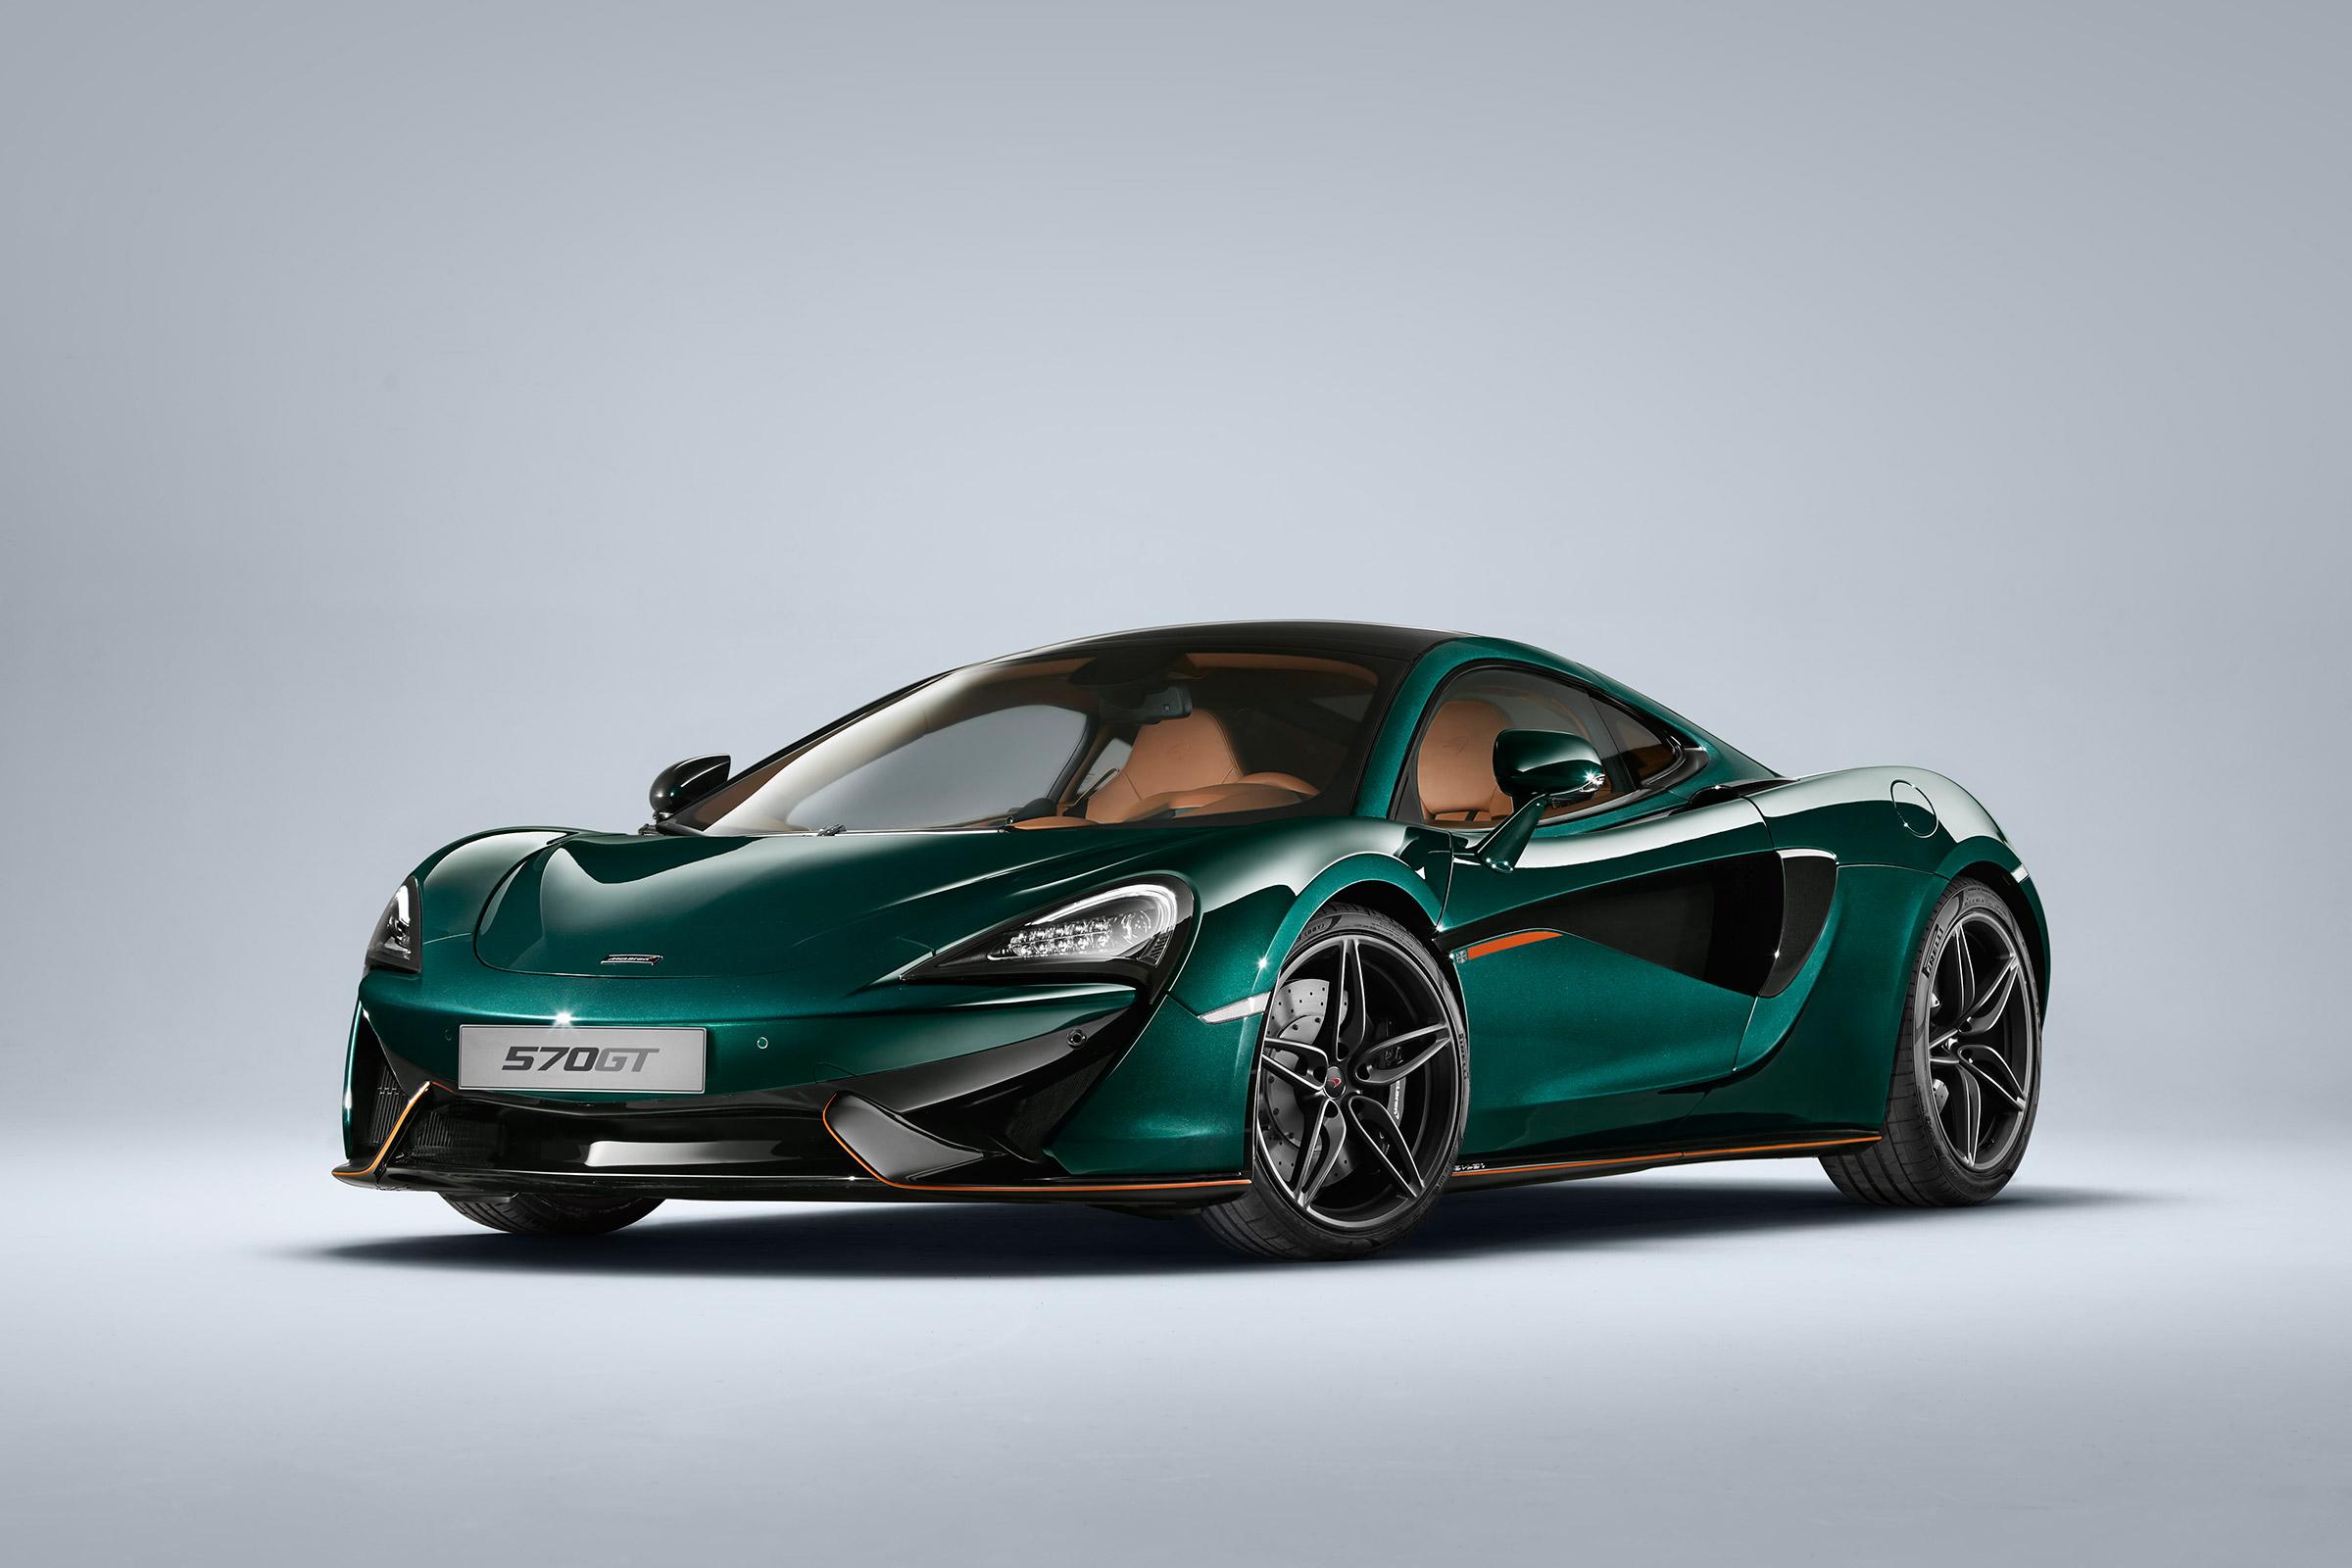 Versão especial do McLaren 570 GT homenageia F1 XP GT thumbnail